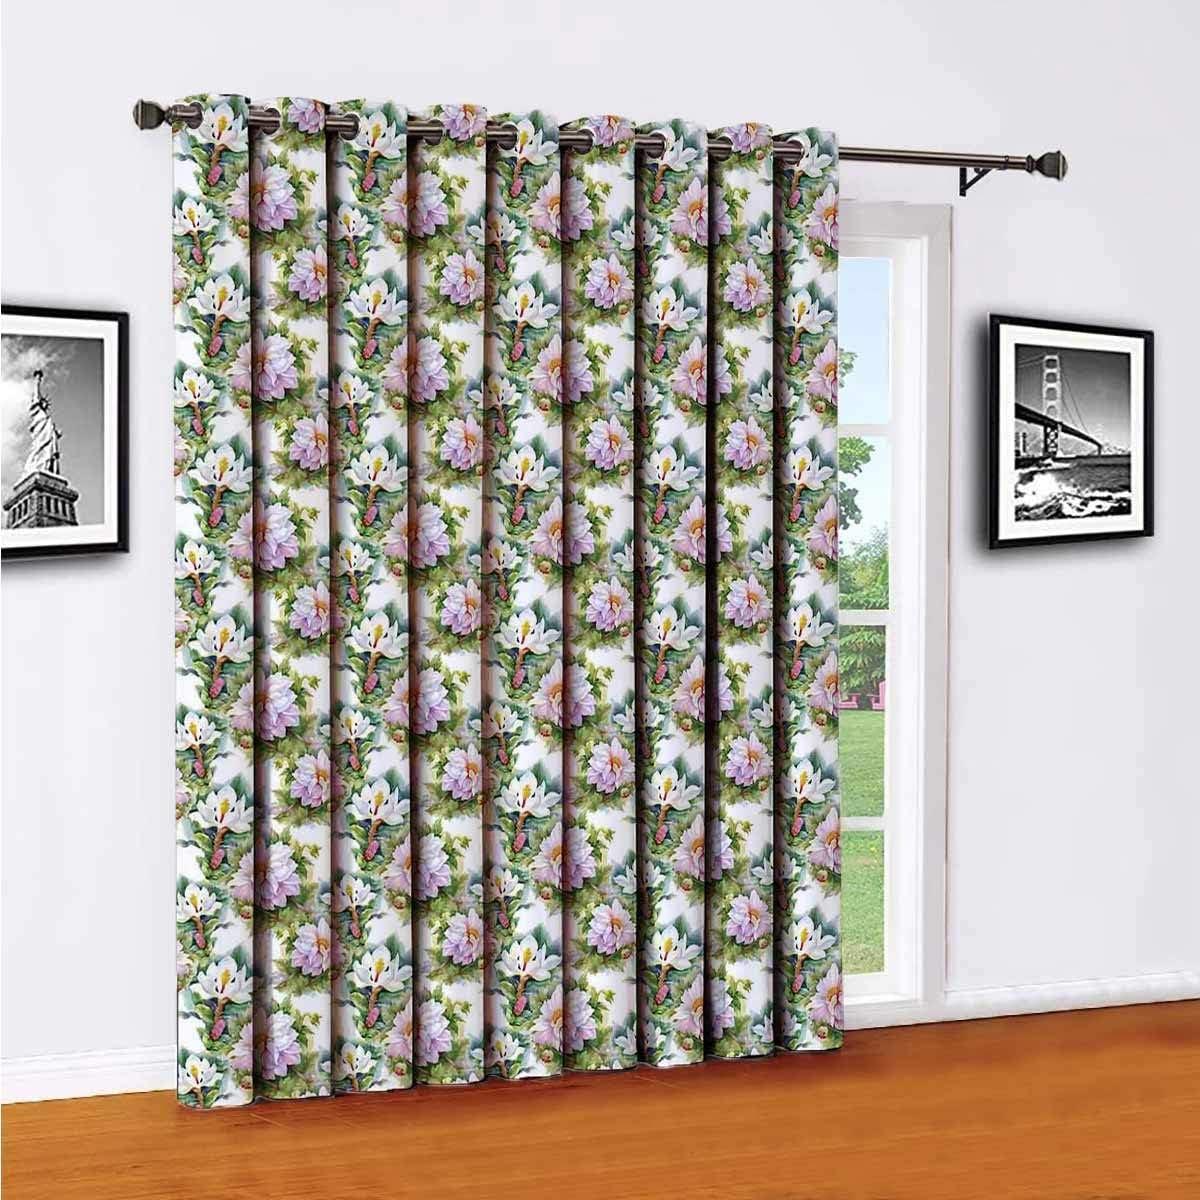 Toopeek Aquarelle Art - Cortinas opacas de poliéster con hojas giratorias, adecuadas para puertas correderas de cristal para sala de estar, cortinas térmicas de 96 x 96 pulgadas